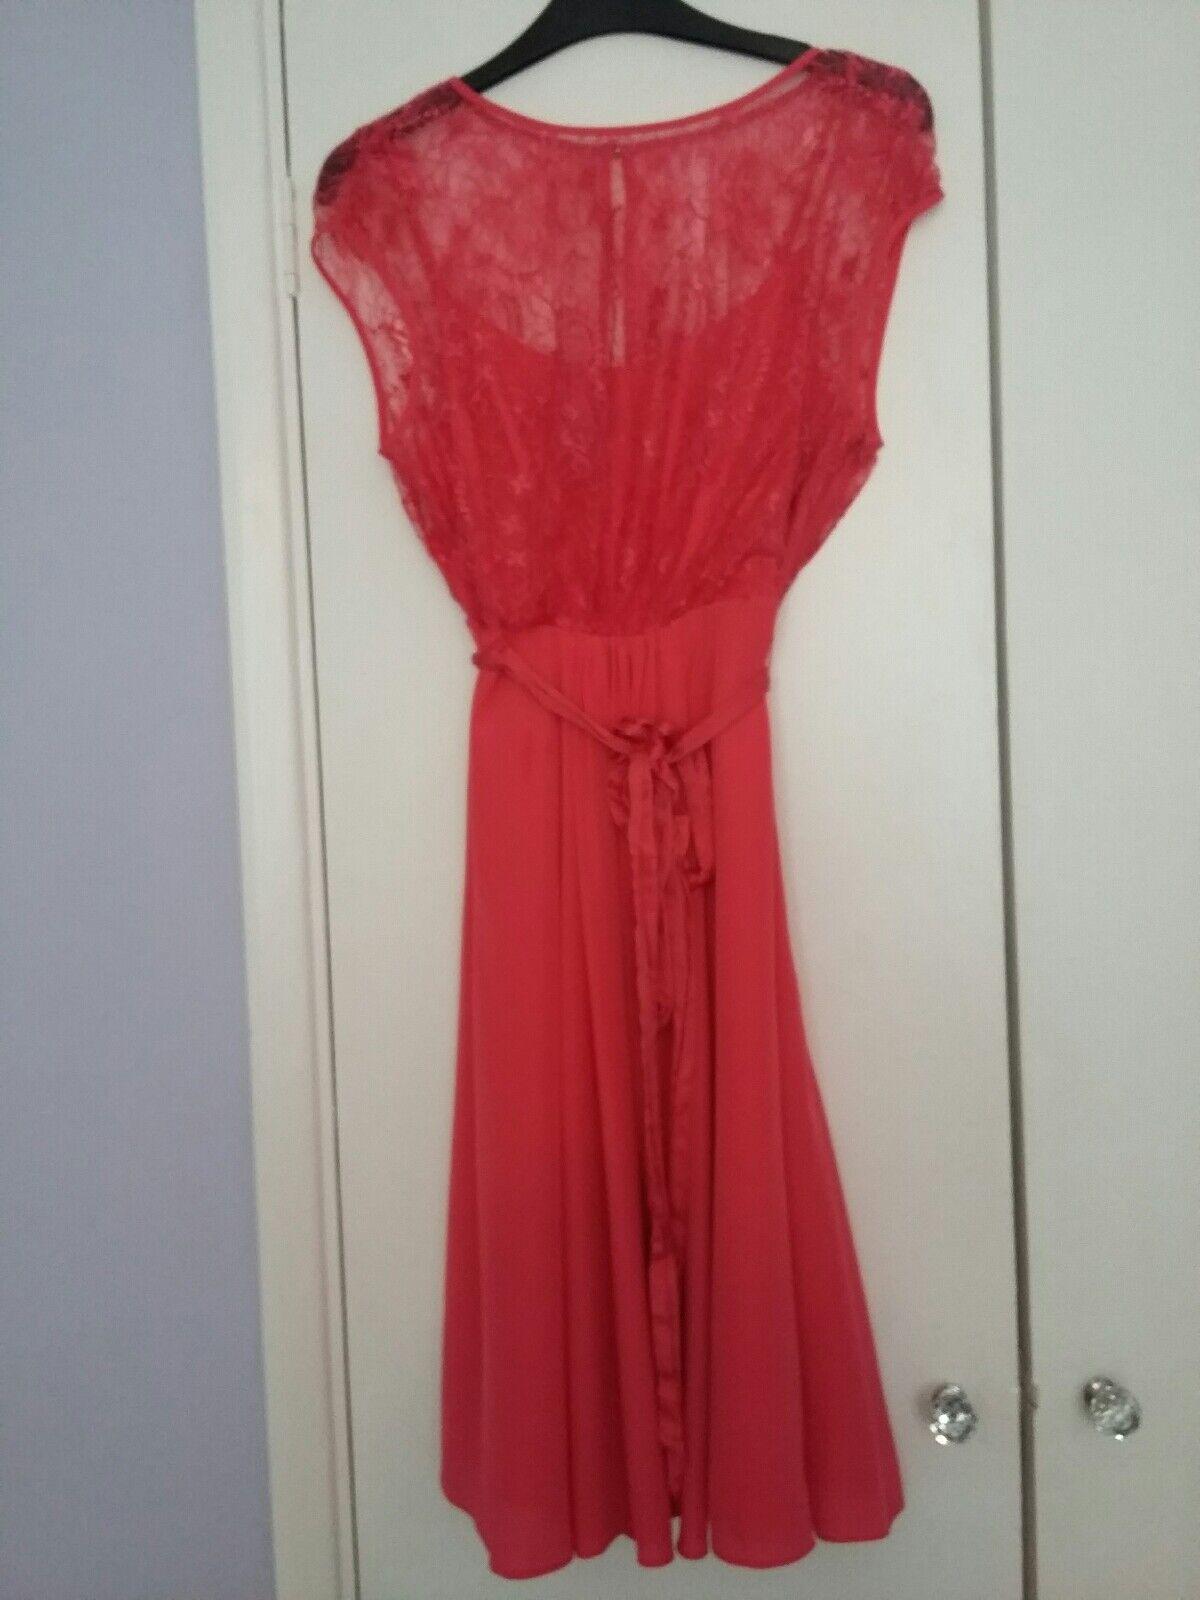 COAST occasion dress size 12